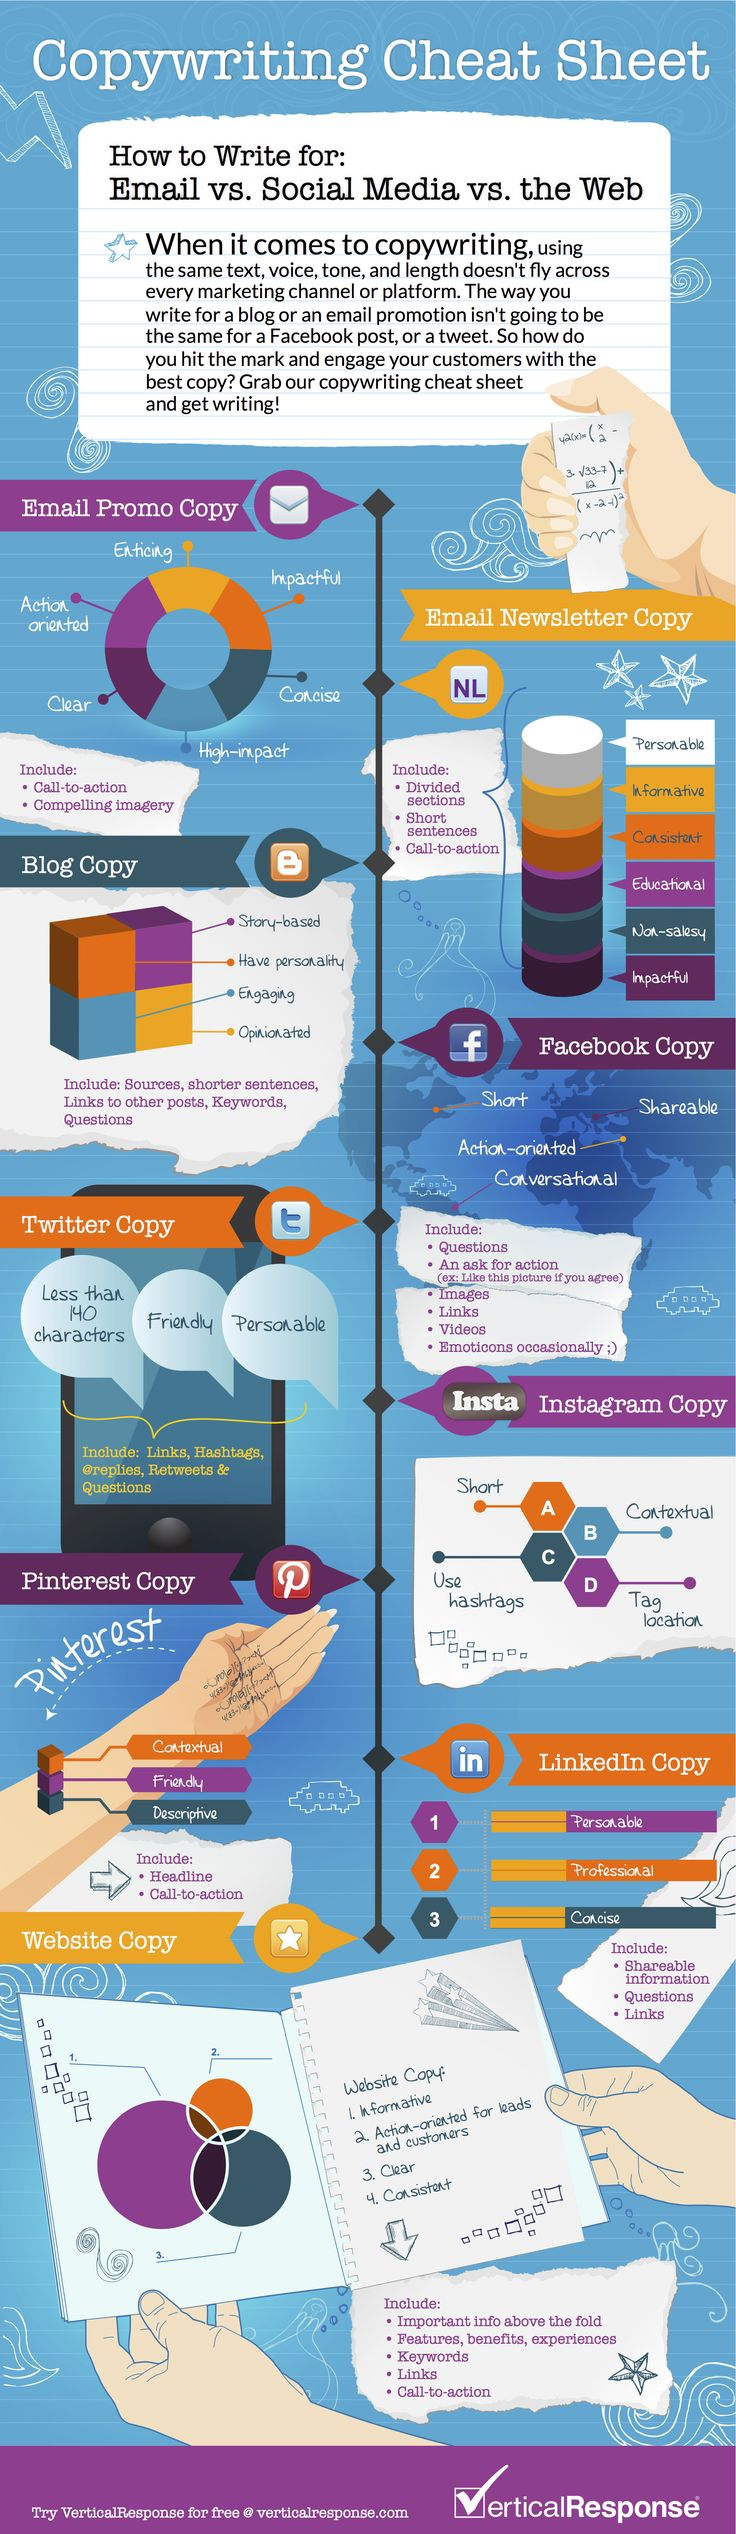 Copywriting Cheat Sheet #infographic #Copywriting www.rubendelaosa.com @rubendelaosa